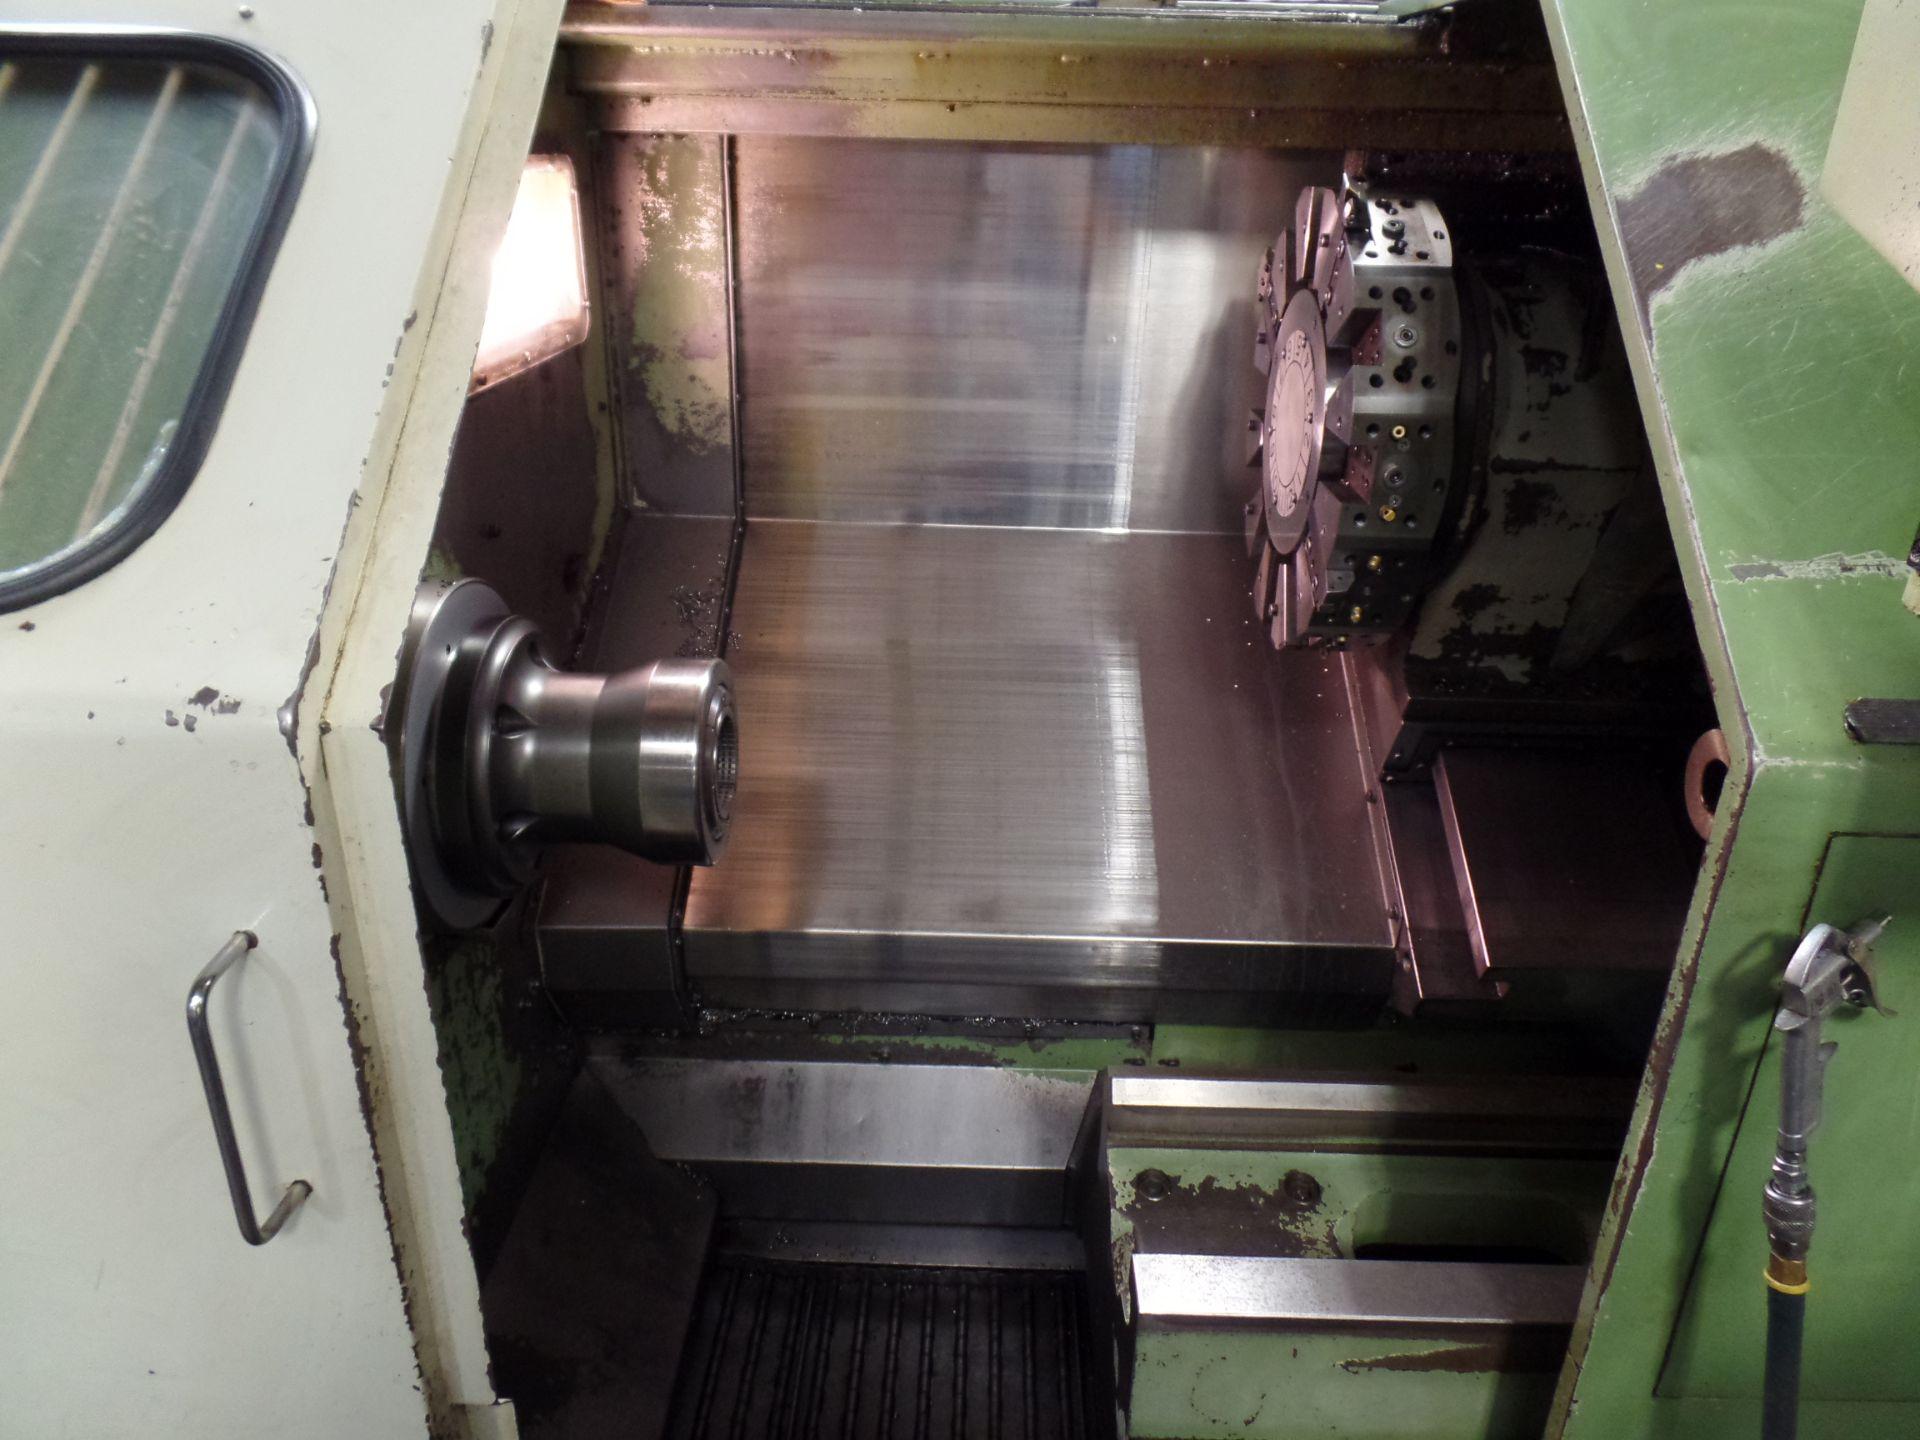 "1996 Okuma LB 25 2 Axis CNC Lathe, 5020 control , chip conveyor, 10"" chuck SN: 02109123 - Image 2 of 7"